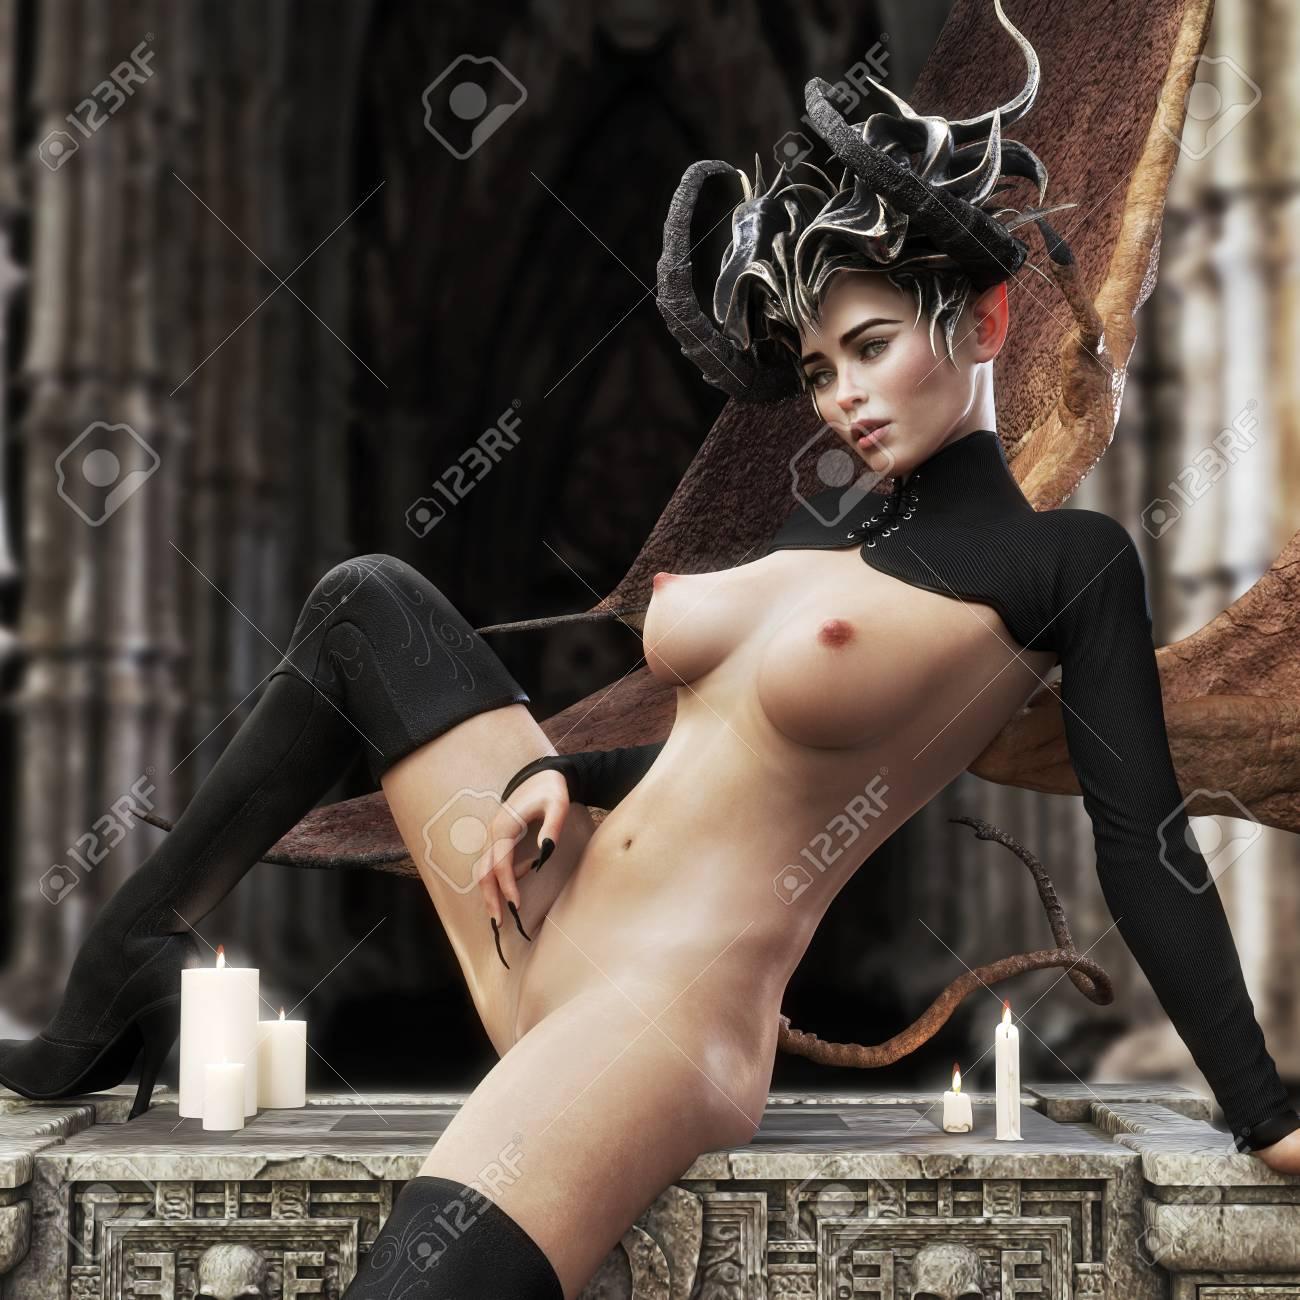 Shanghai cute and beautiful nude girl photo